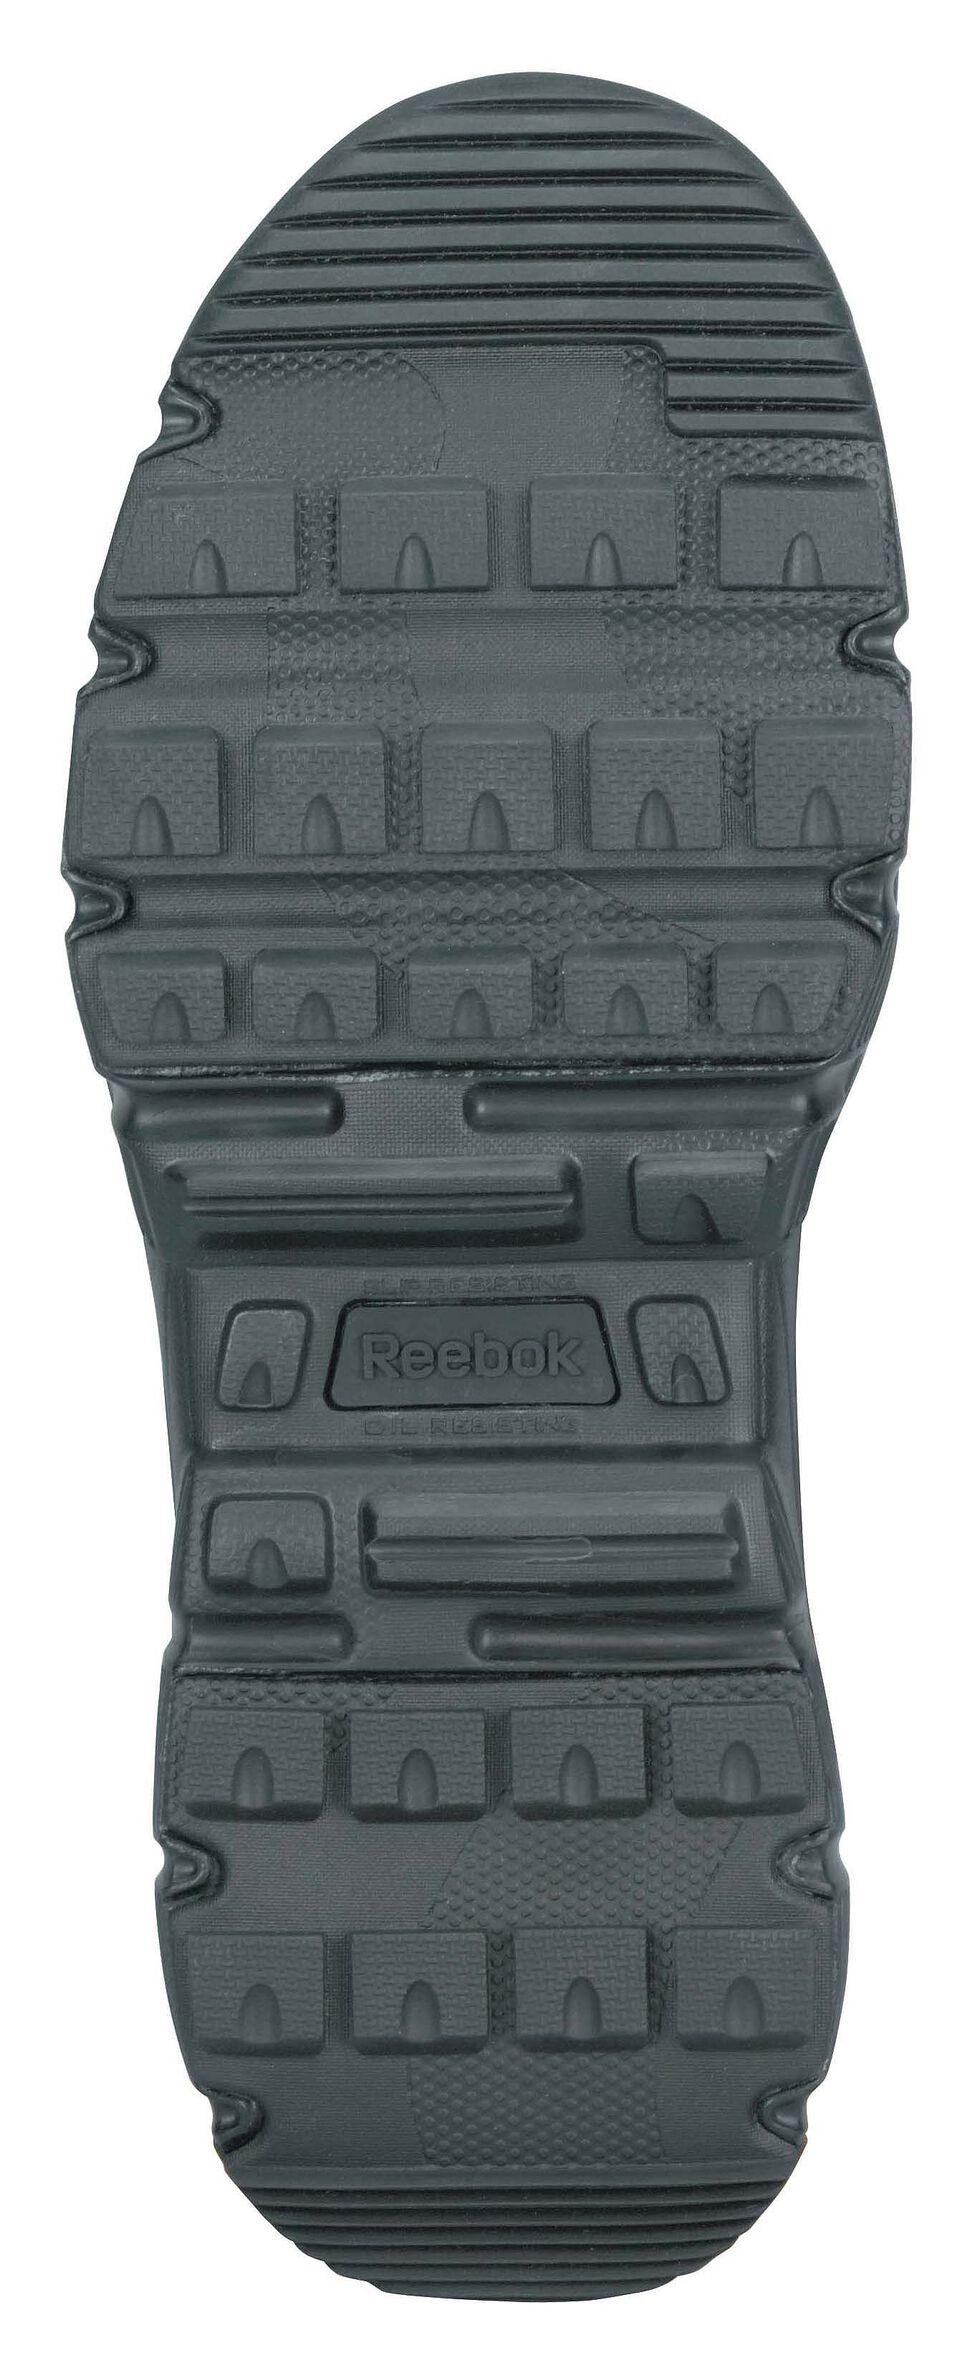 "Reebok Men's Dauntless 8"" Tactical Boots - Round Toe, Black, hi-res"